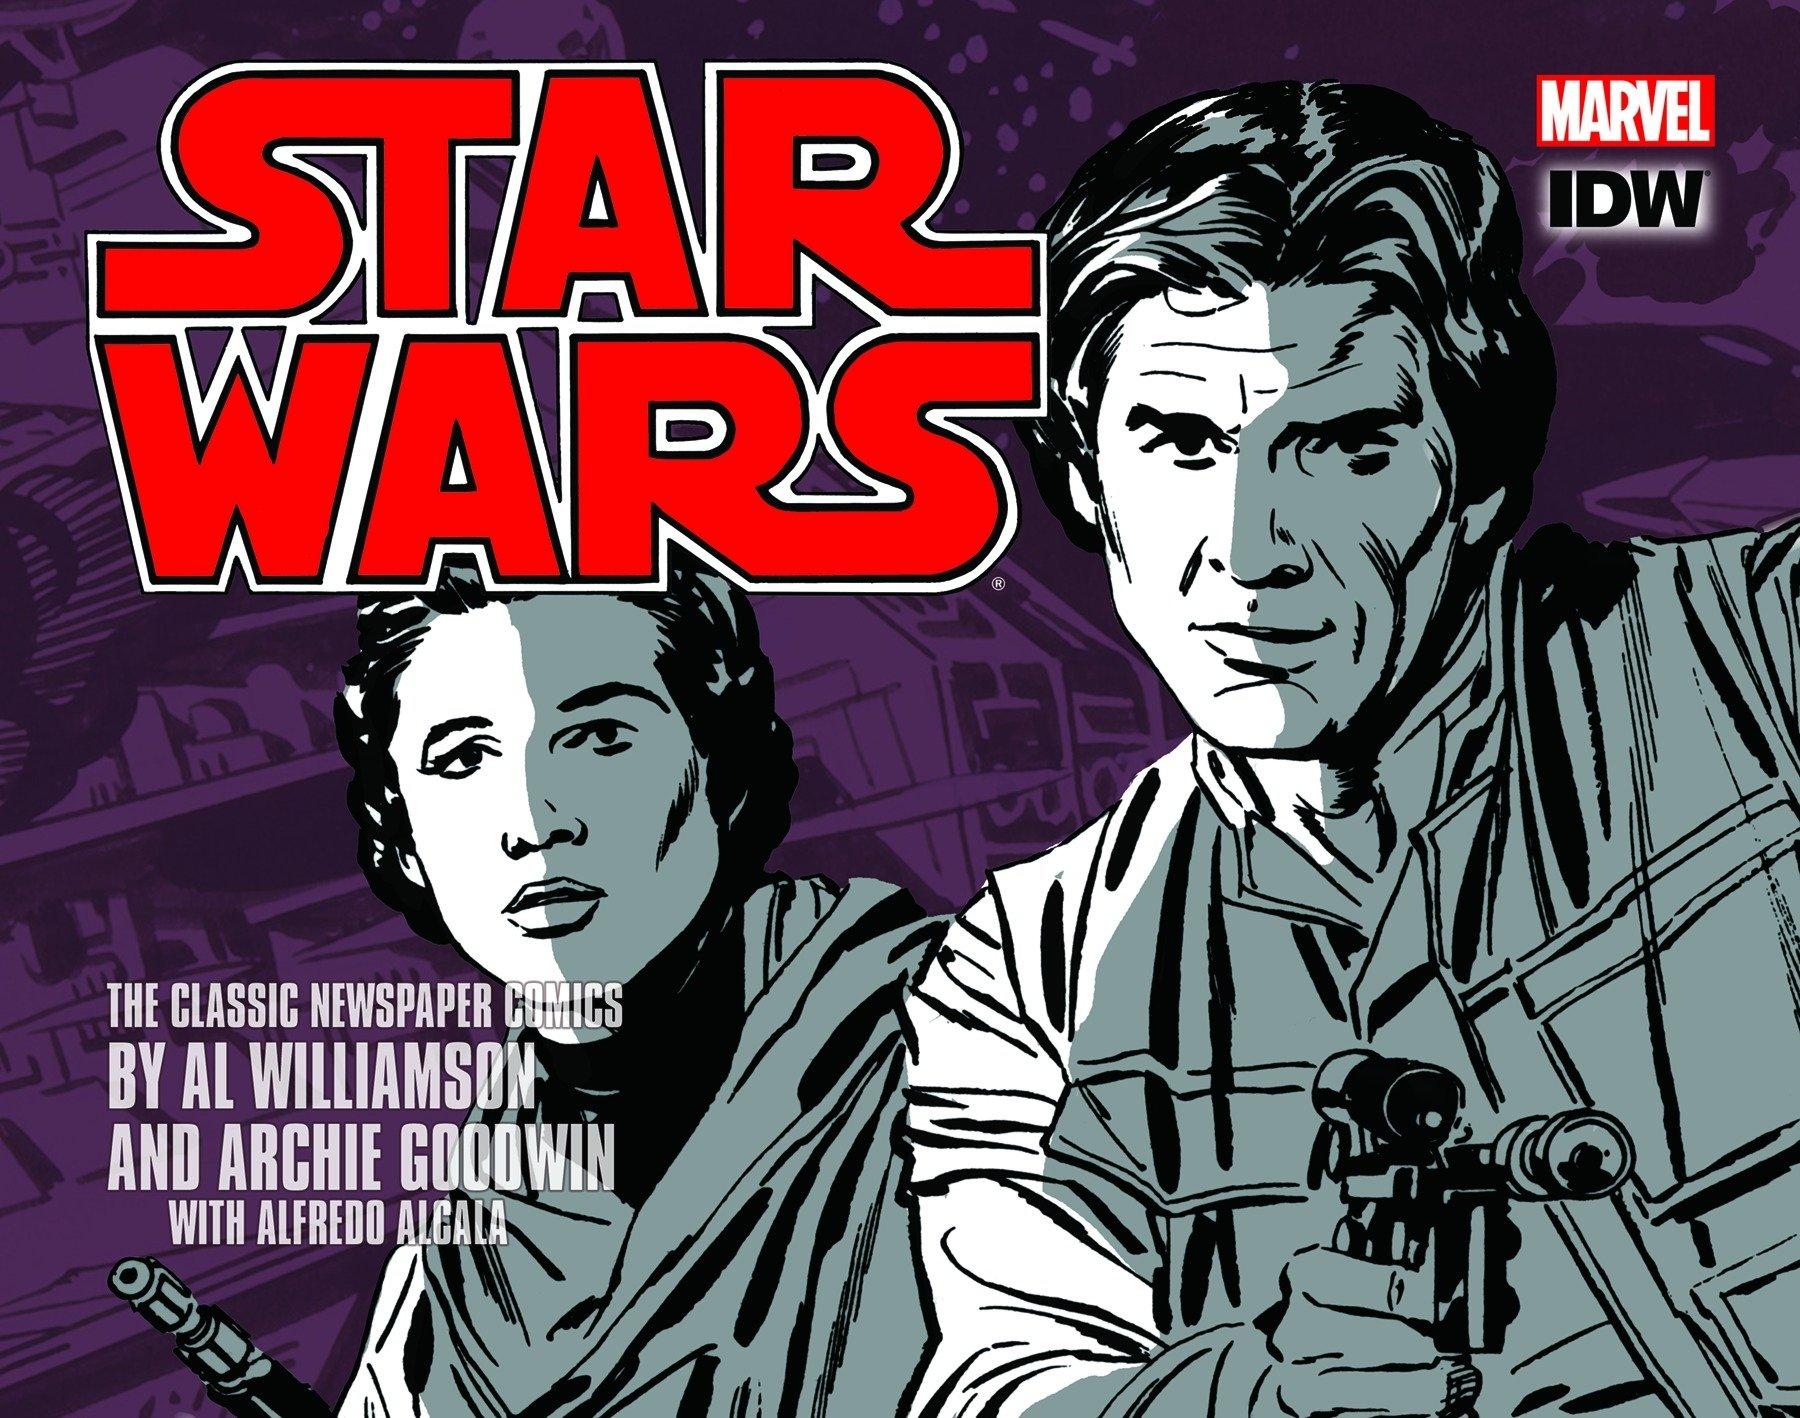 Star Wars: The Classic Newspaper Comics Volume 2